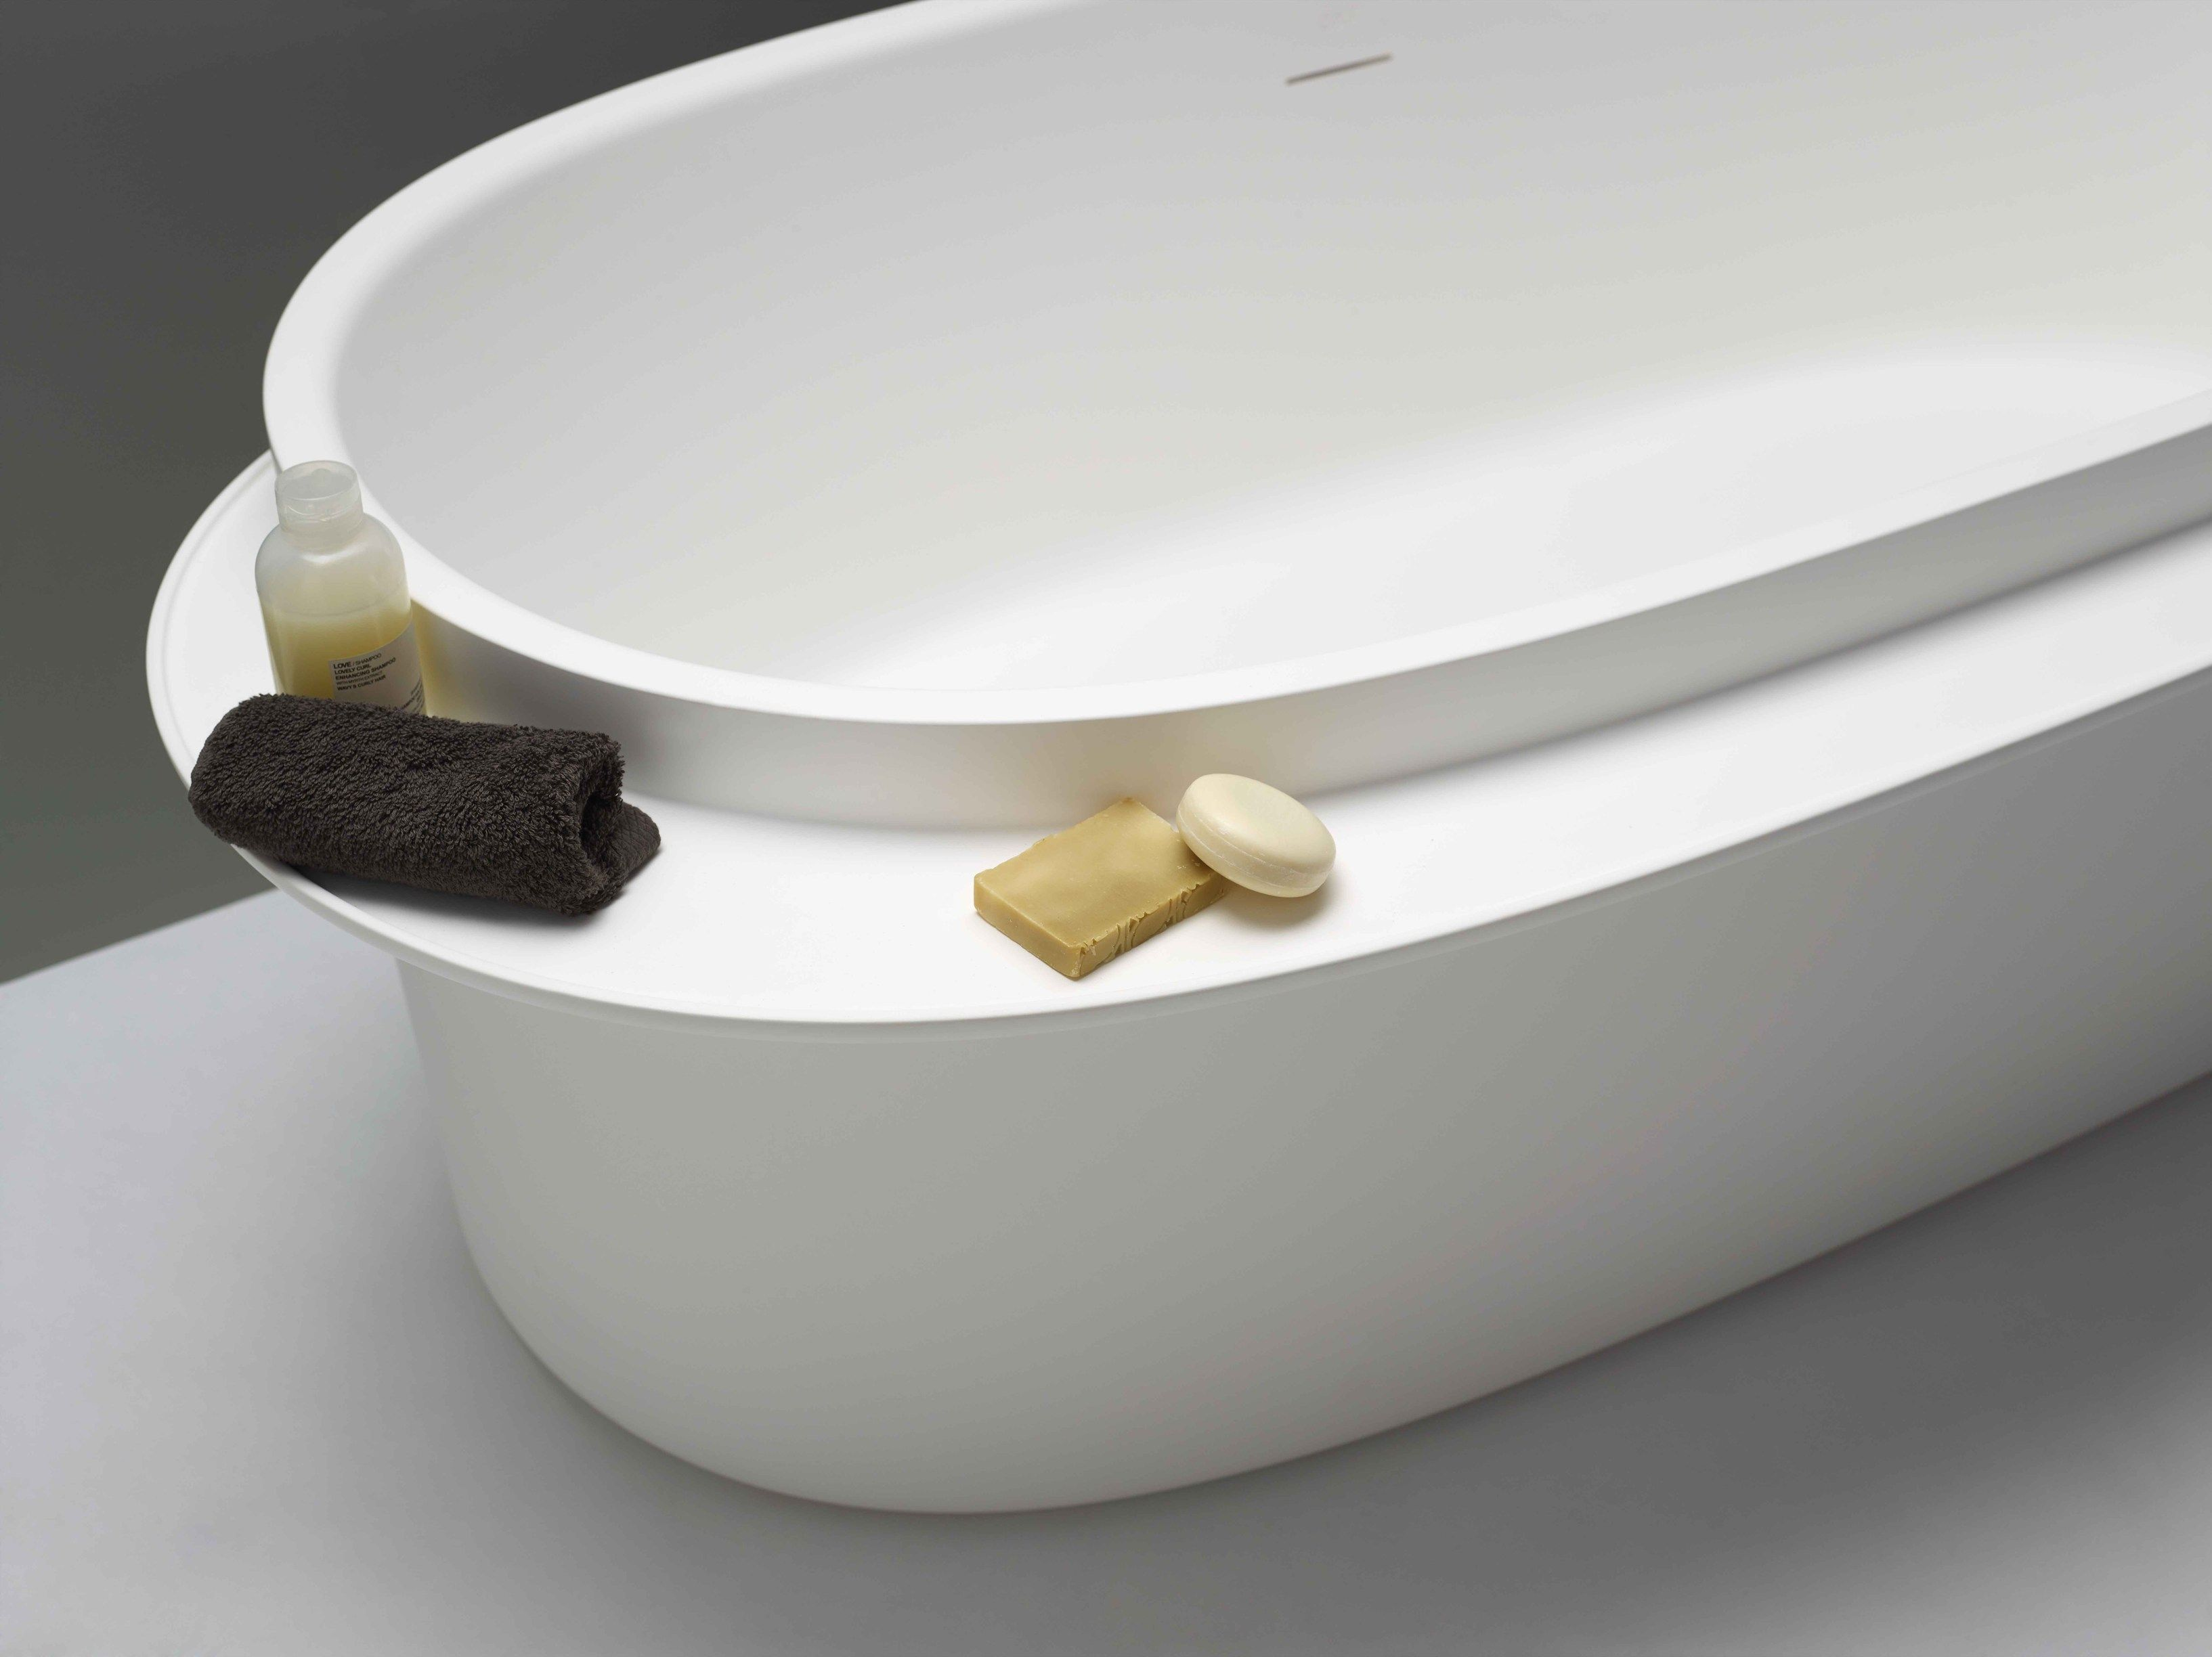 Vasca Da Bagno Metallo : Vasca da bagno ovale in livingtec plateau vasca da bagno ex t